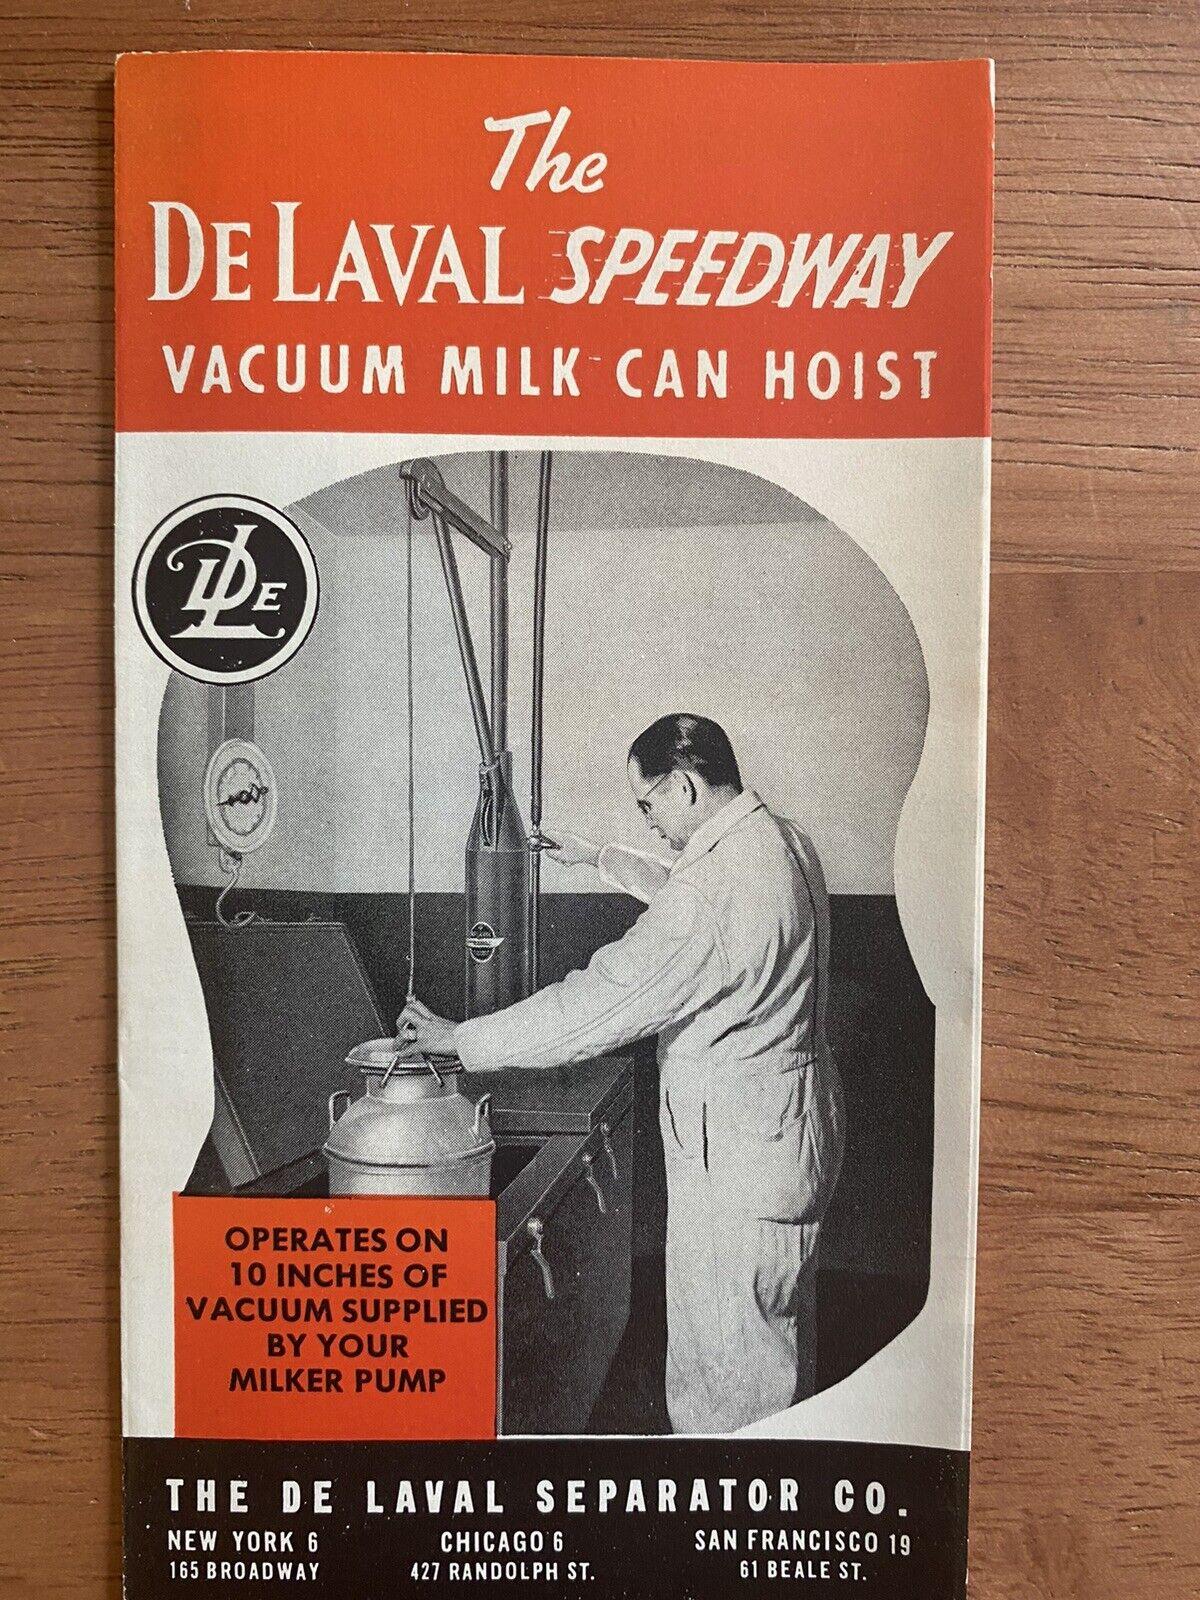 De Laval 1960/'s Employee Paper Hat Vintage Coolers Milkers Dairy Columbus OH